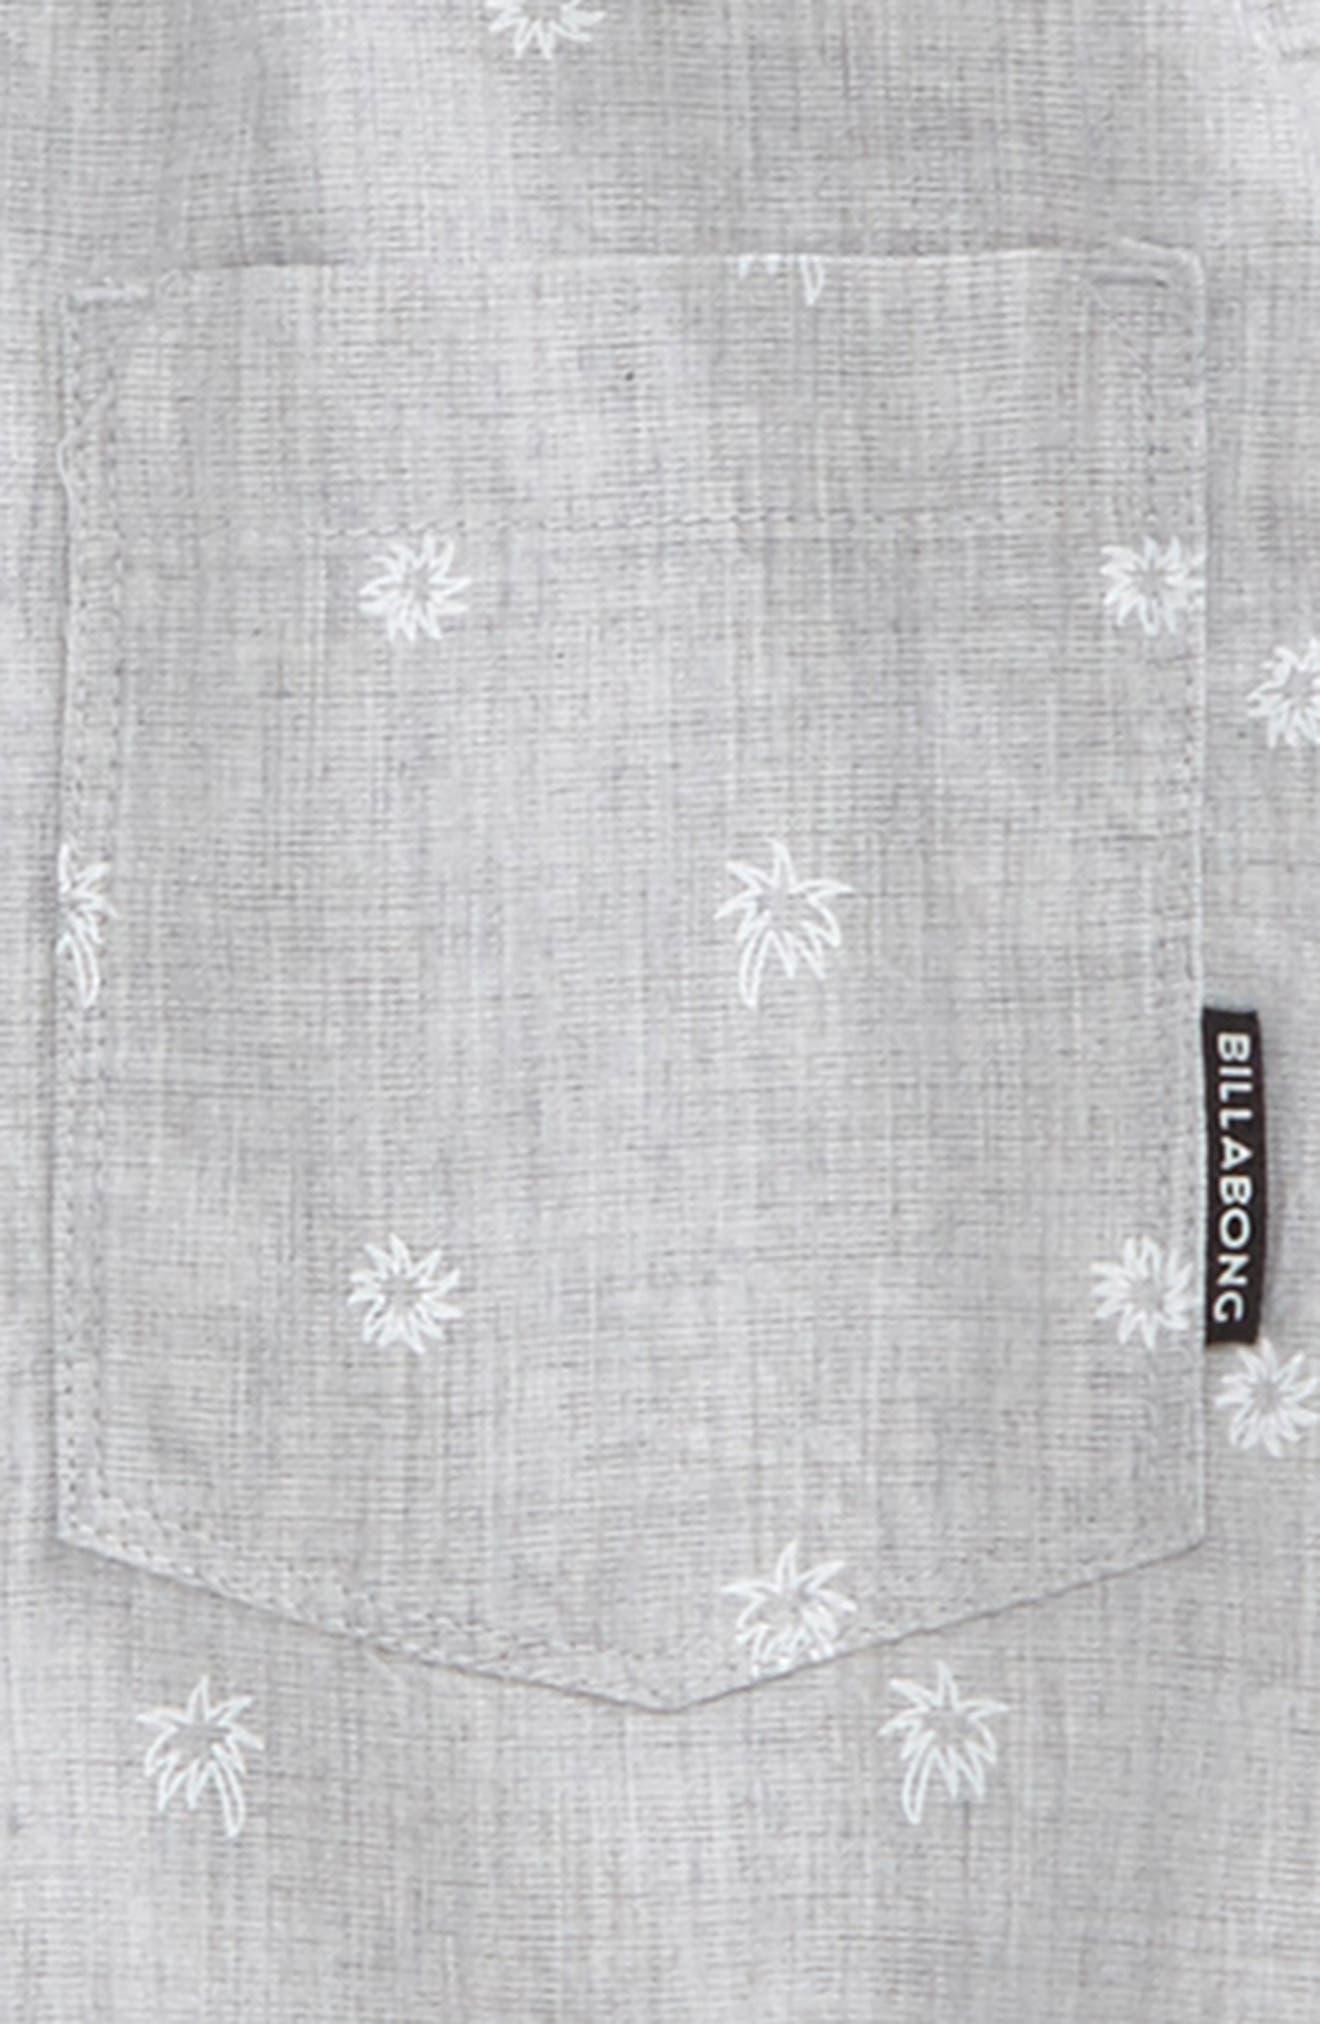 Alternate Image 2  - Billabong Sundays Mini Woven Shirt (Toddler Boys & Little Boys)